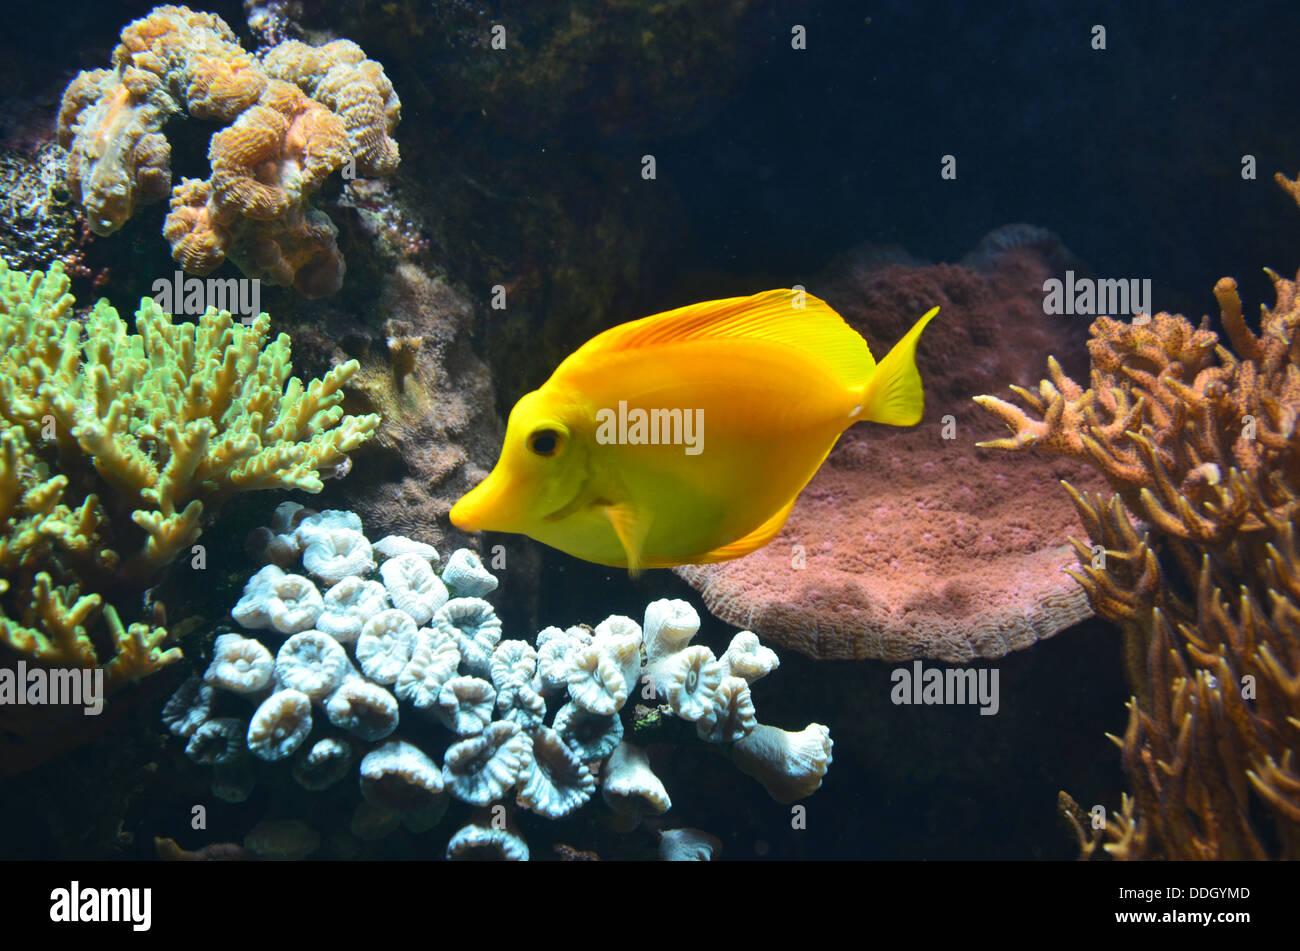 Saltwater fish species images for Saltwater fish representative species